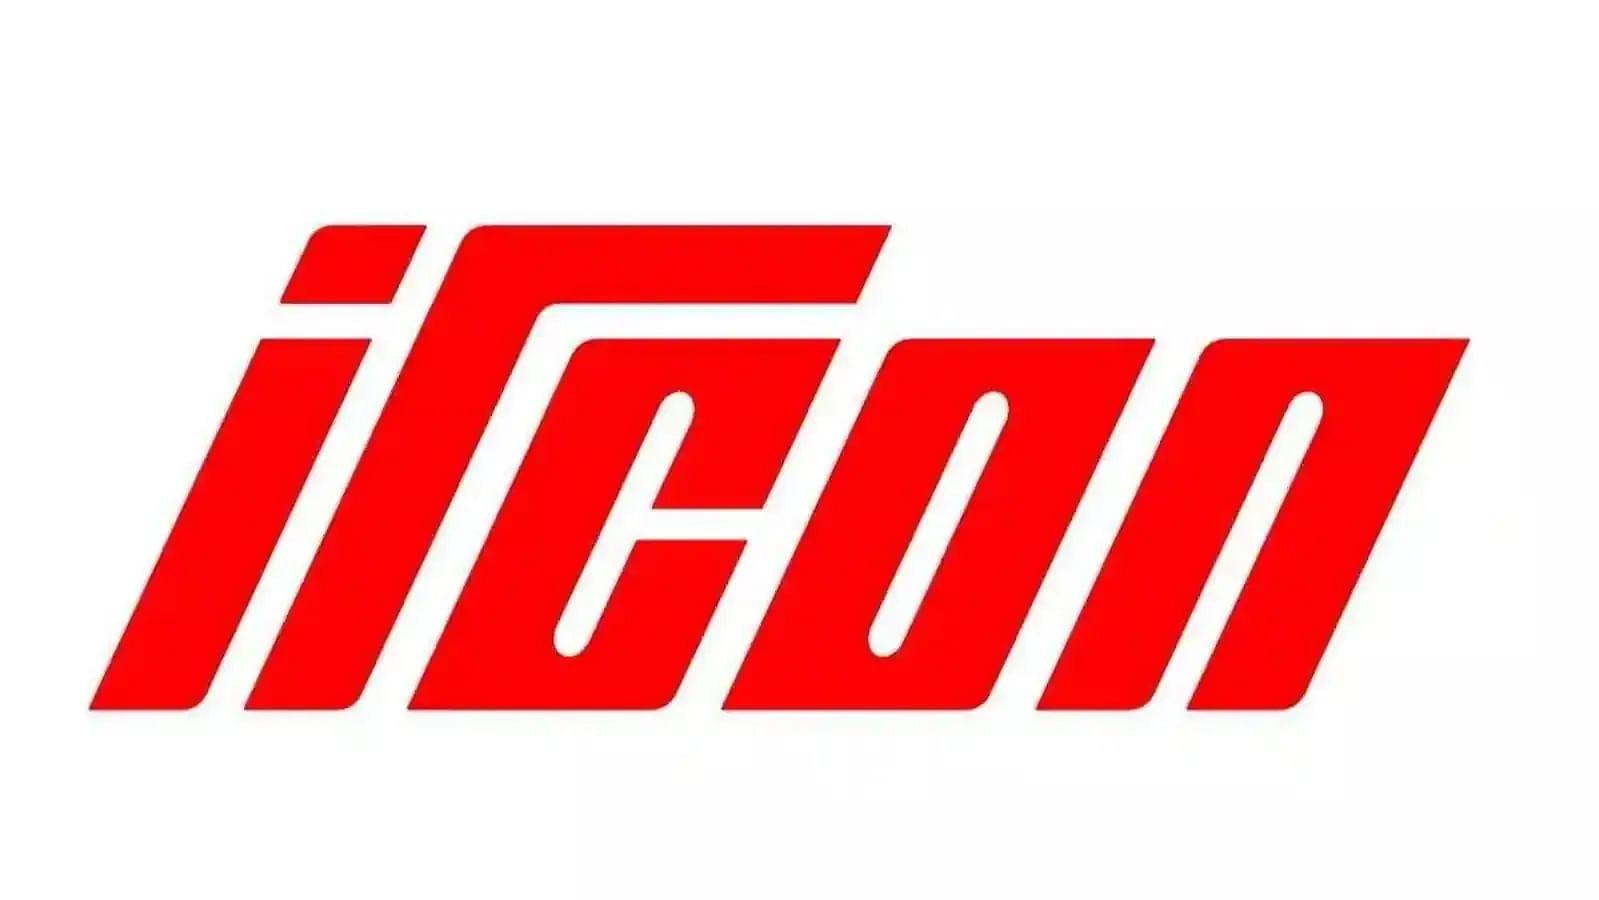 IRCON Recruitment 2021 - Manager (S&T) Vacancy, Job Openings